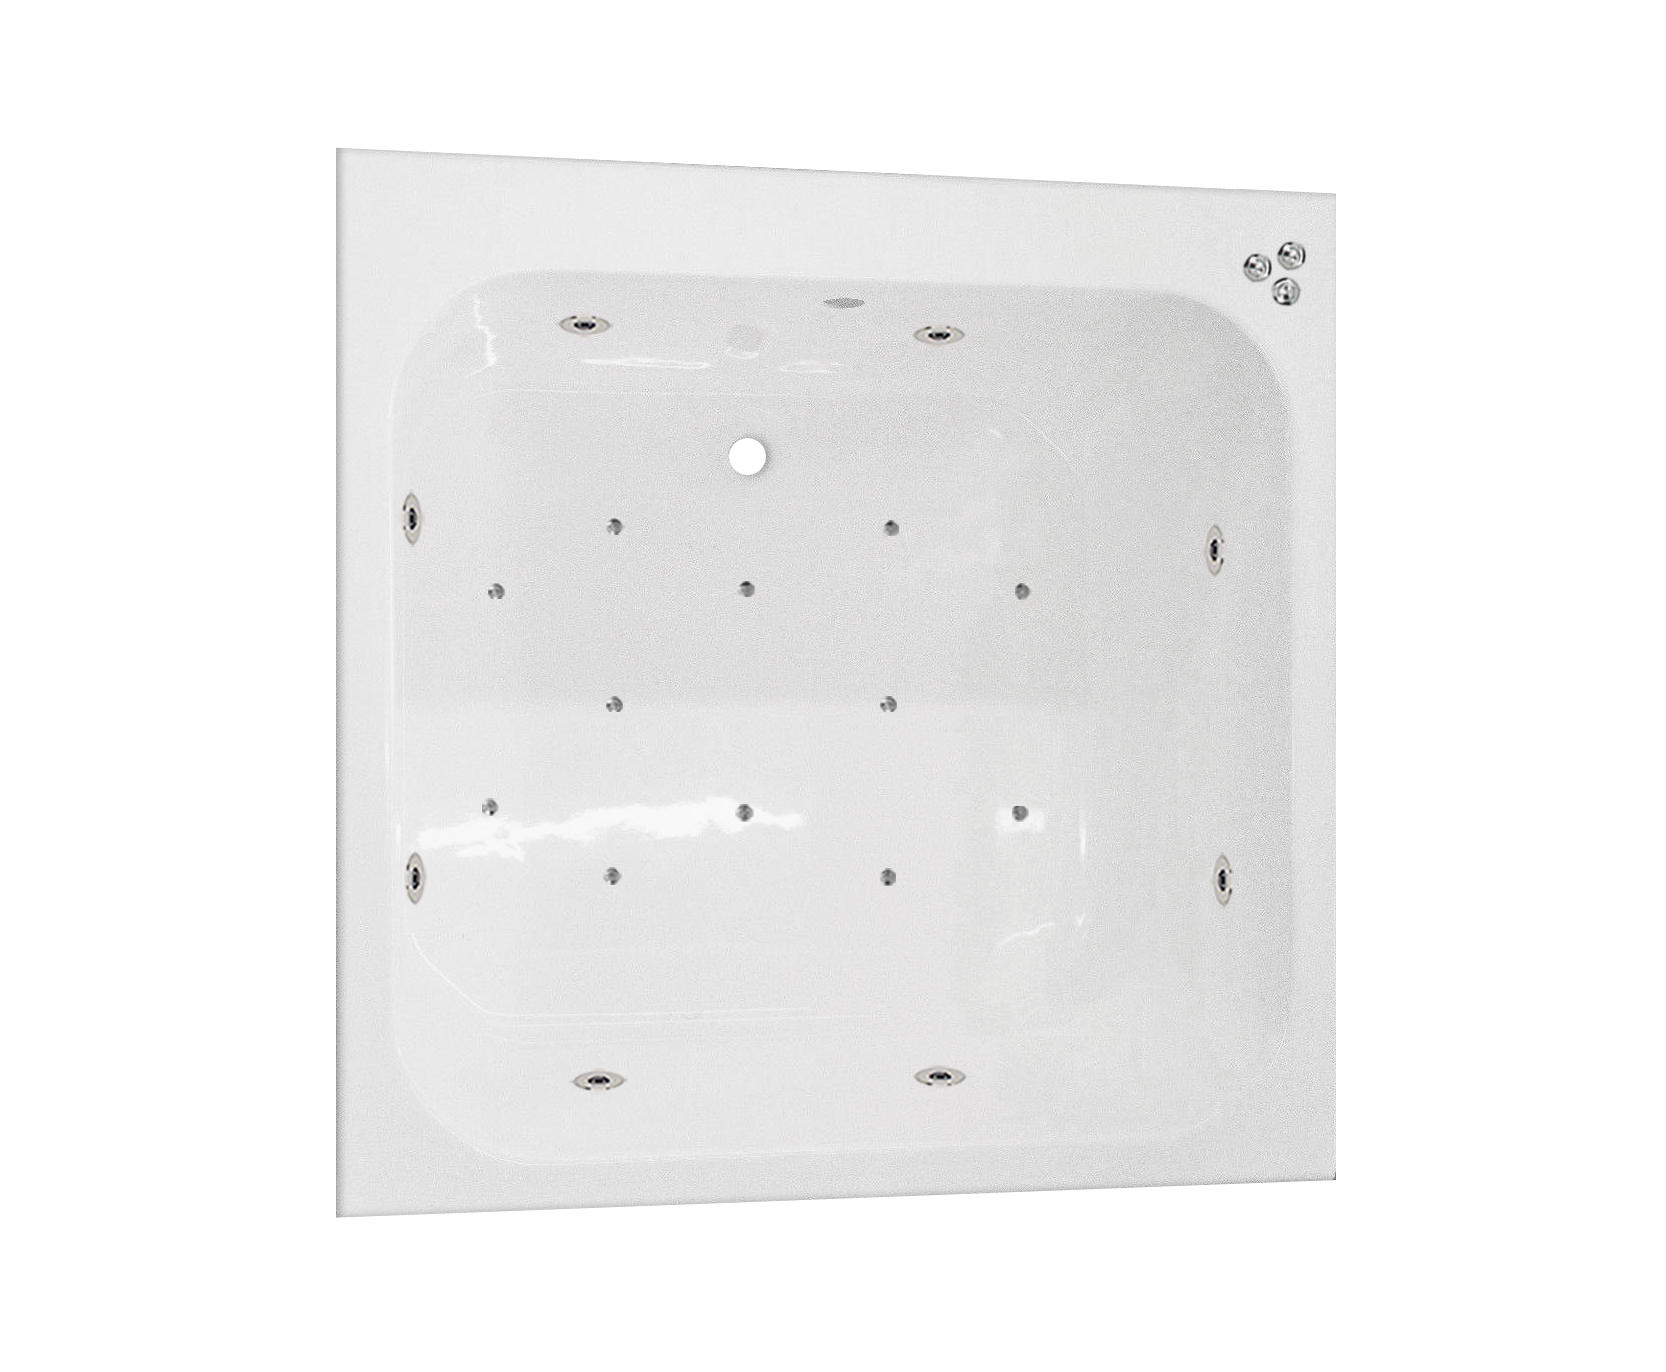 Cool The Whirlpool Bath Shop Ideas - Bathroom and Shower Ideas ...